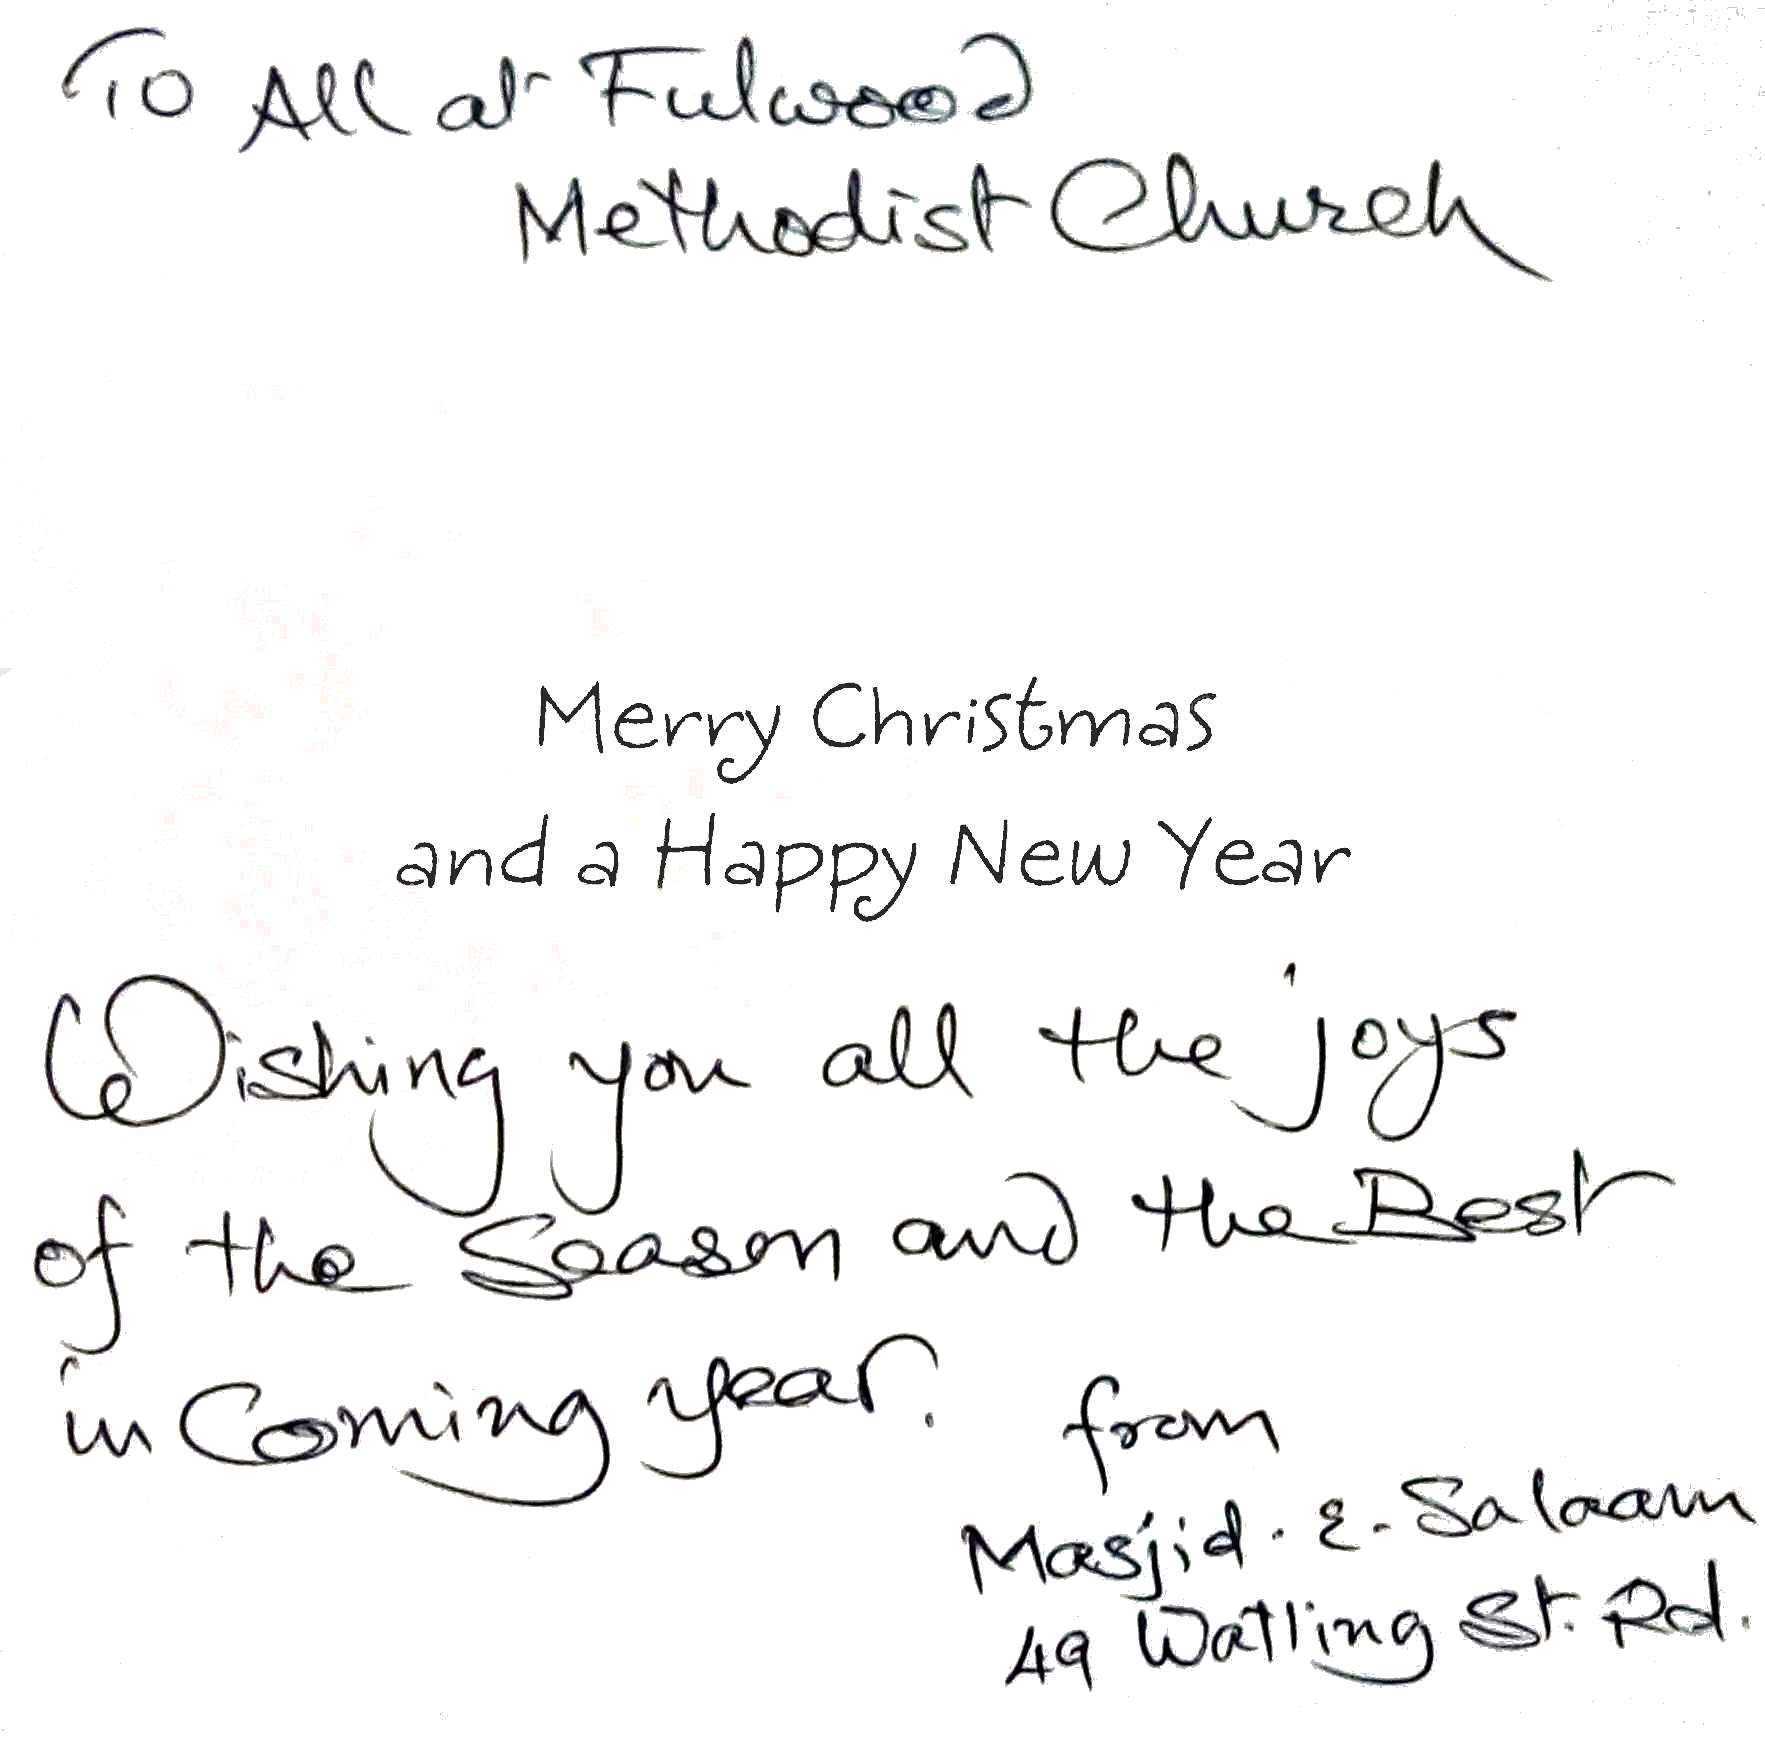 FULWOOD METHODIST CHURCH